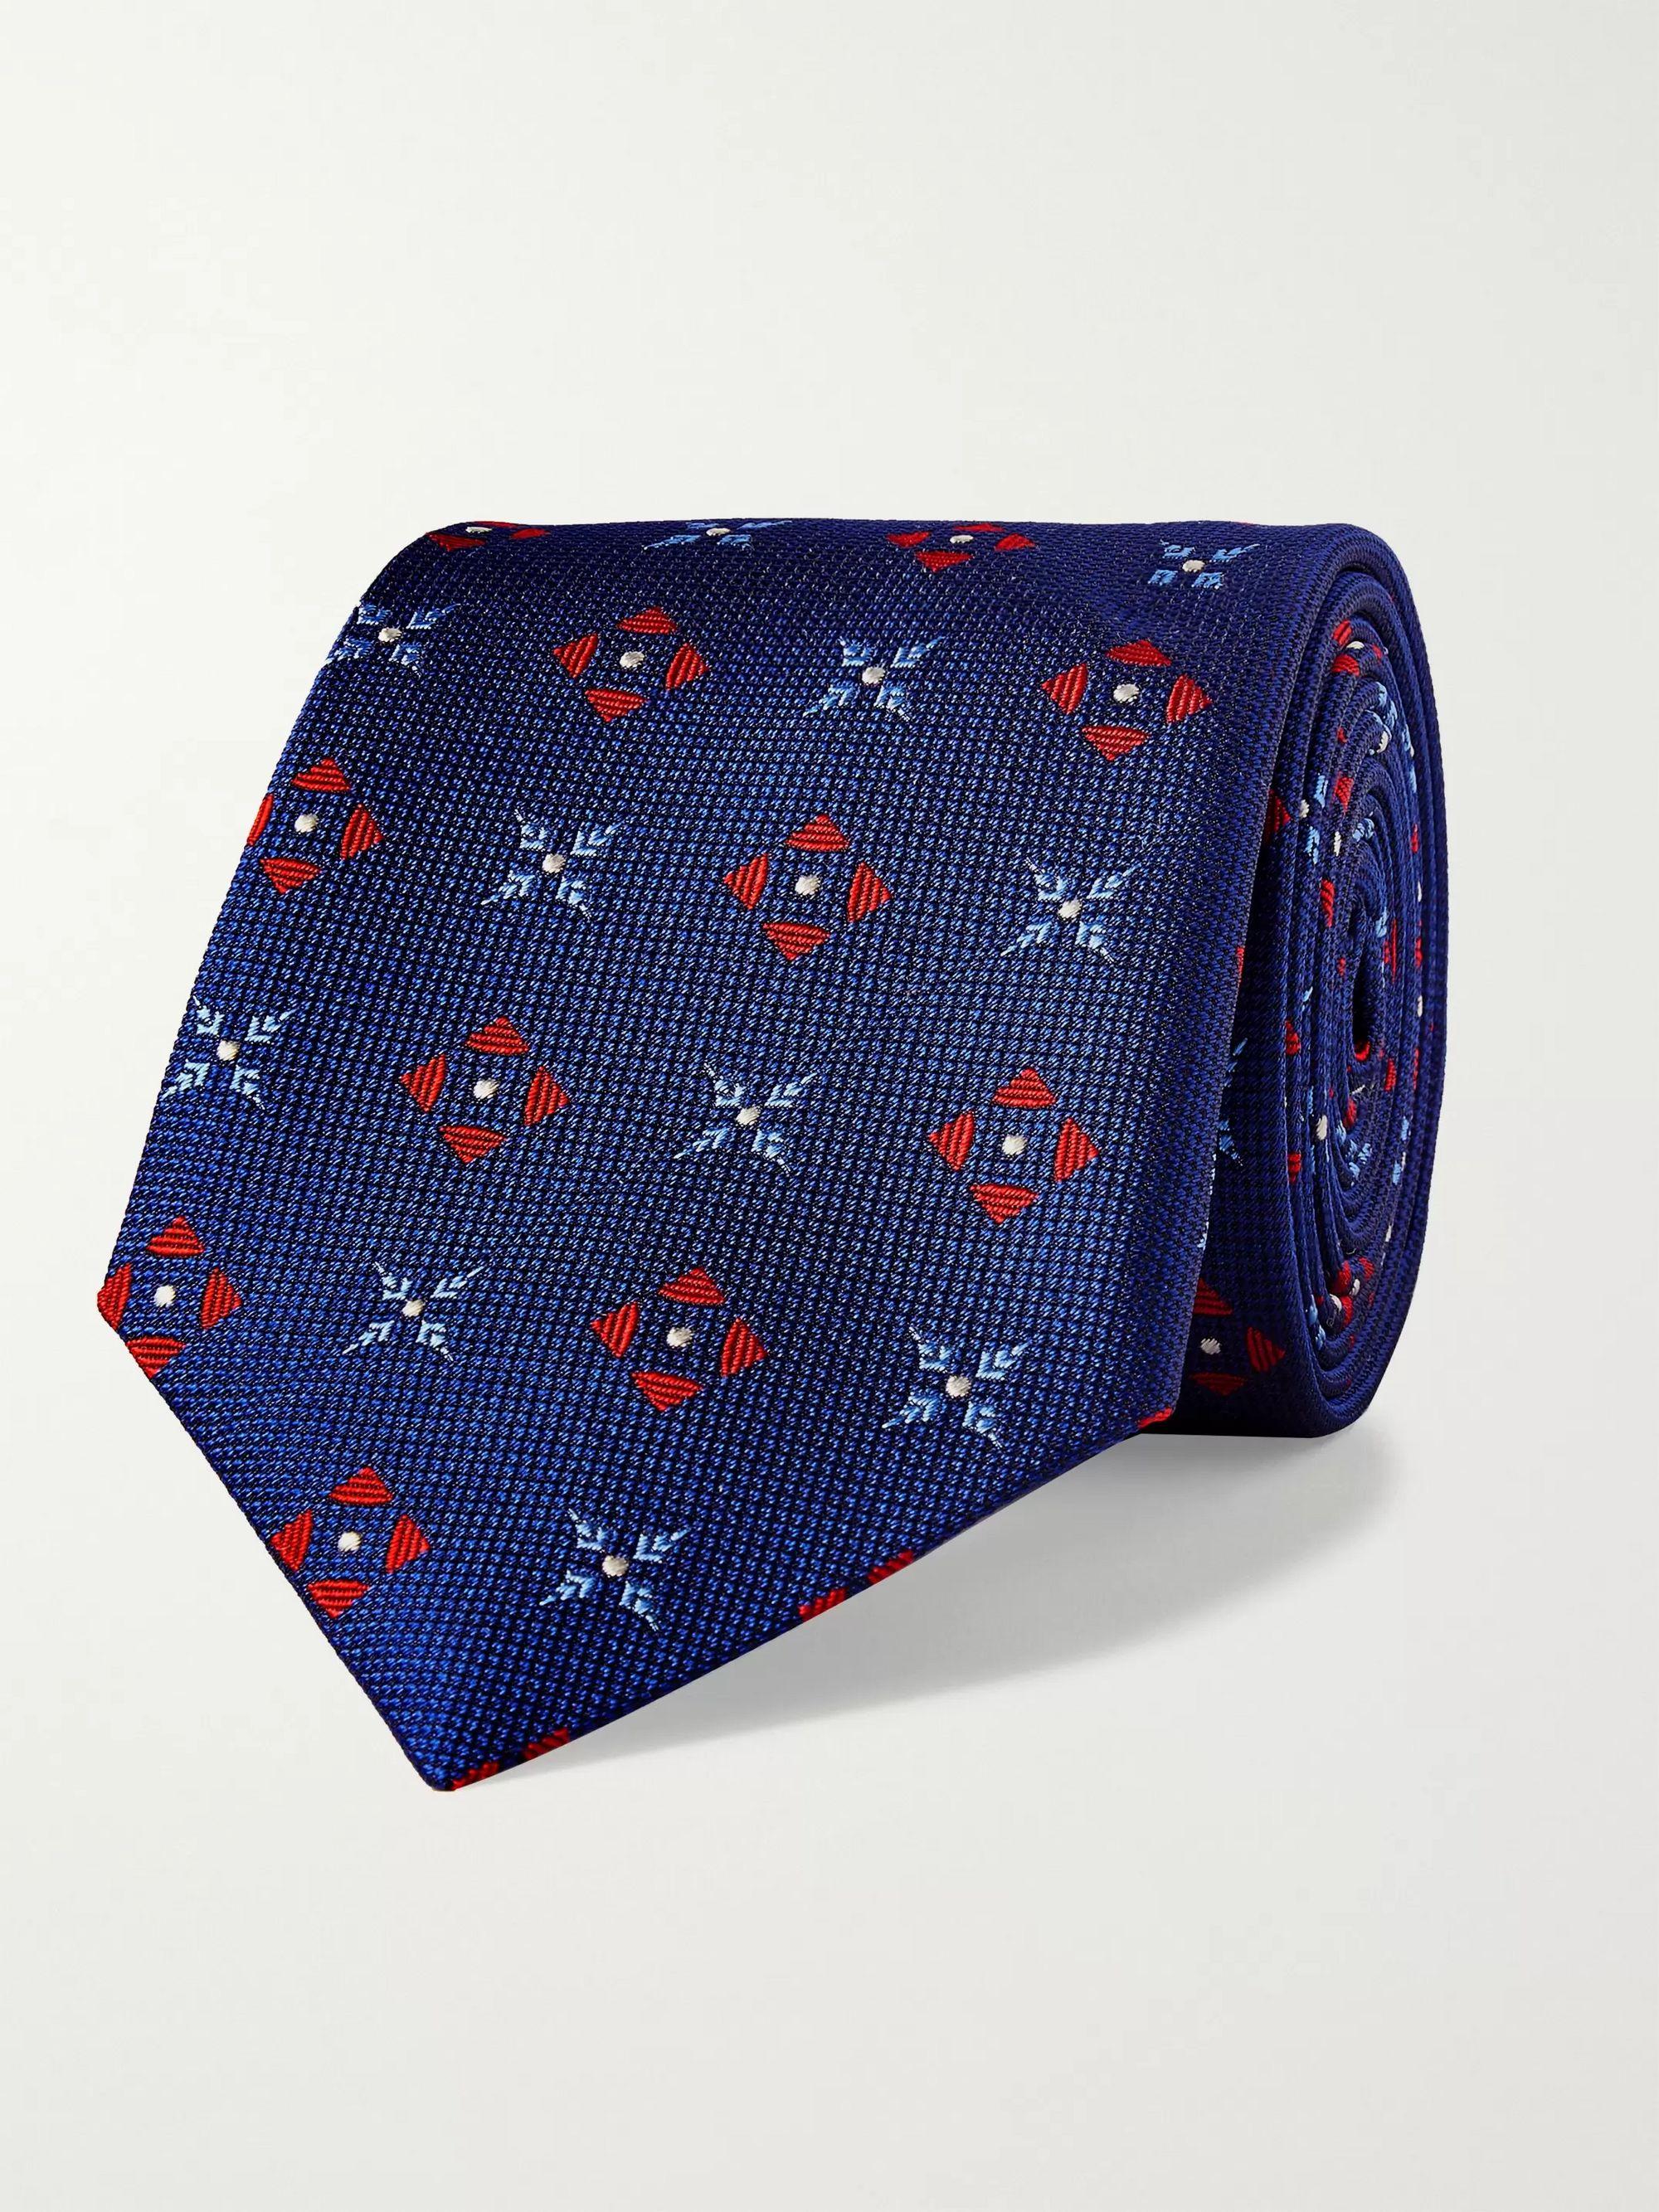 Blue 8cm Silk-Jacquard Tie | Turnbull & Asser | MR PORTER